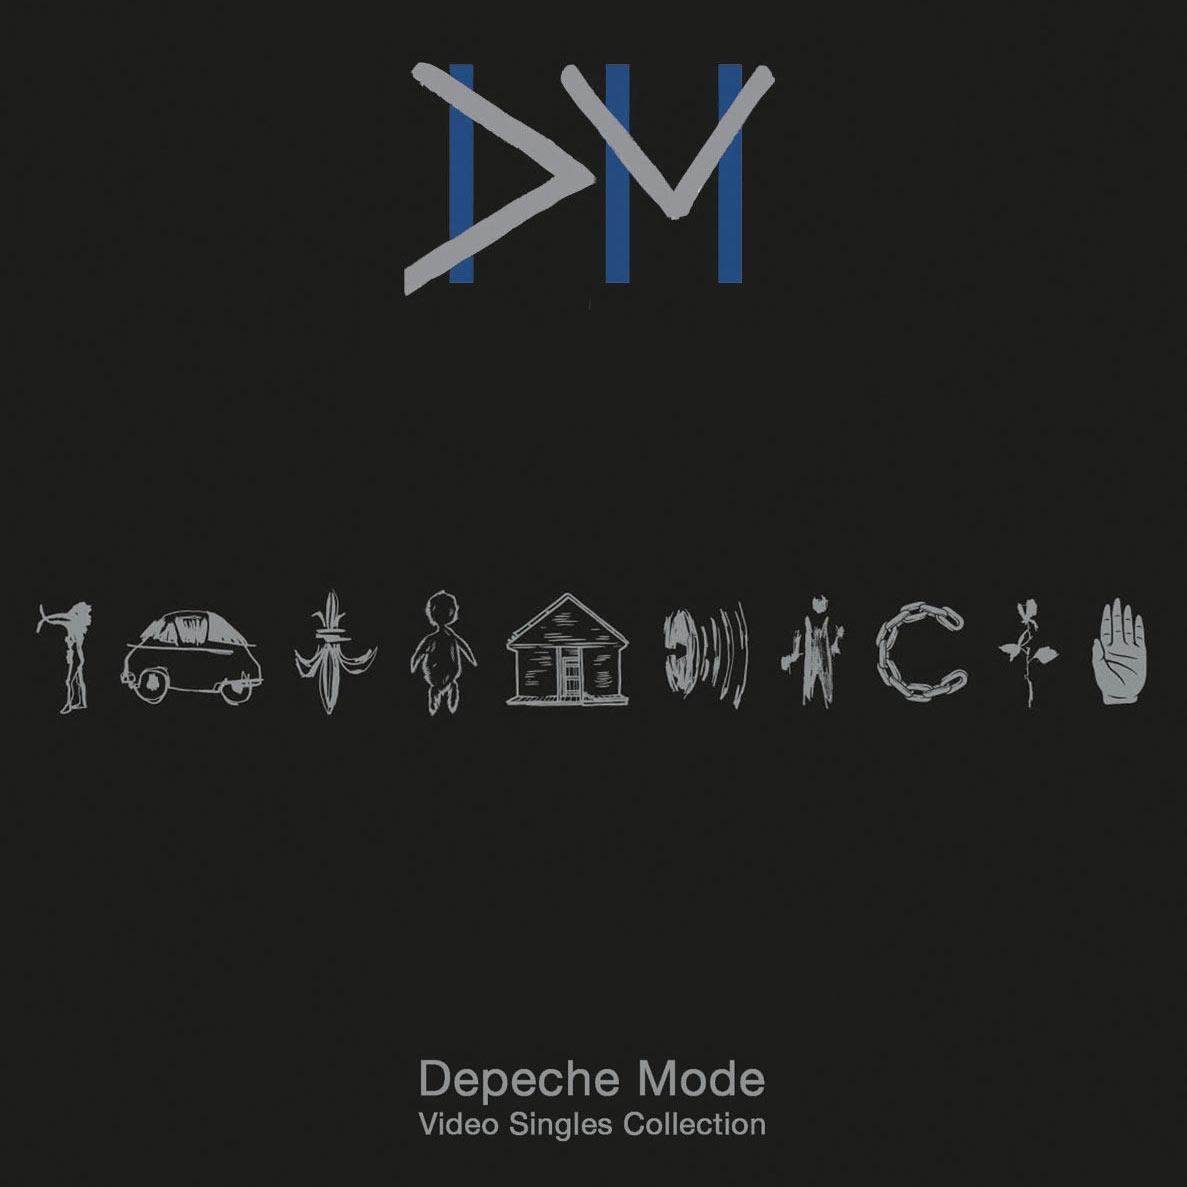 depeche-mode-video-collection-crop